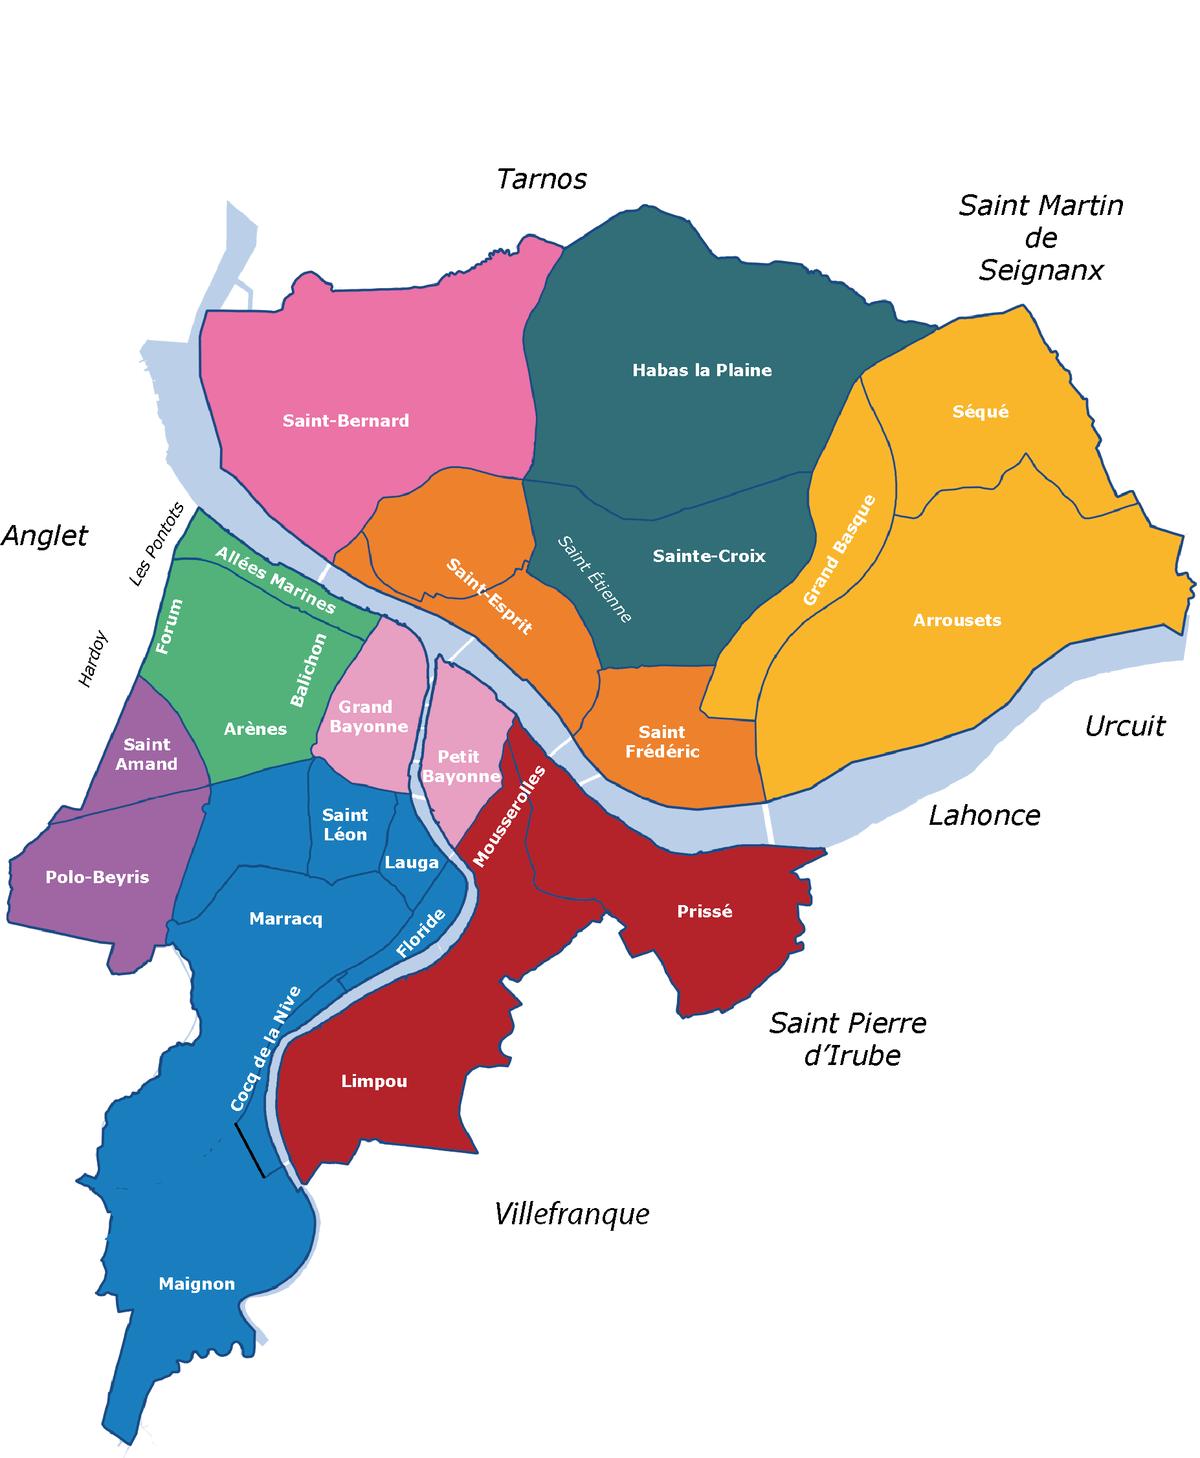 Allée De Niert Bayonne file:quartiers de bayonne - wikimedia commons